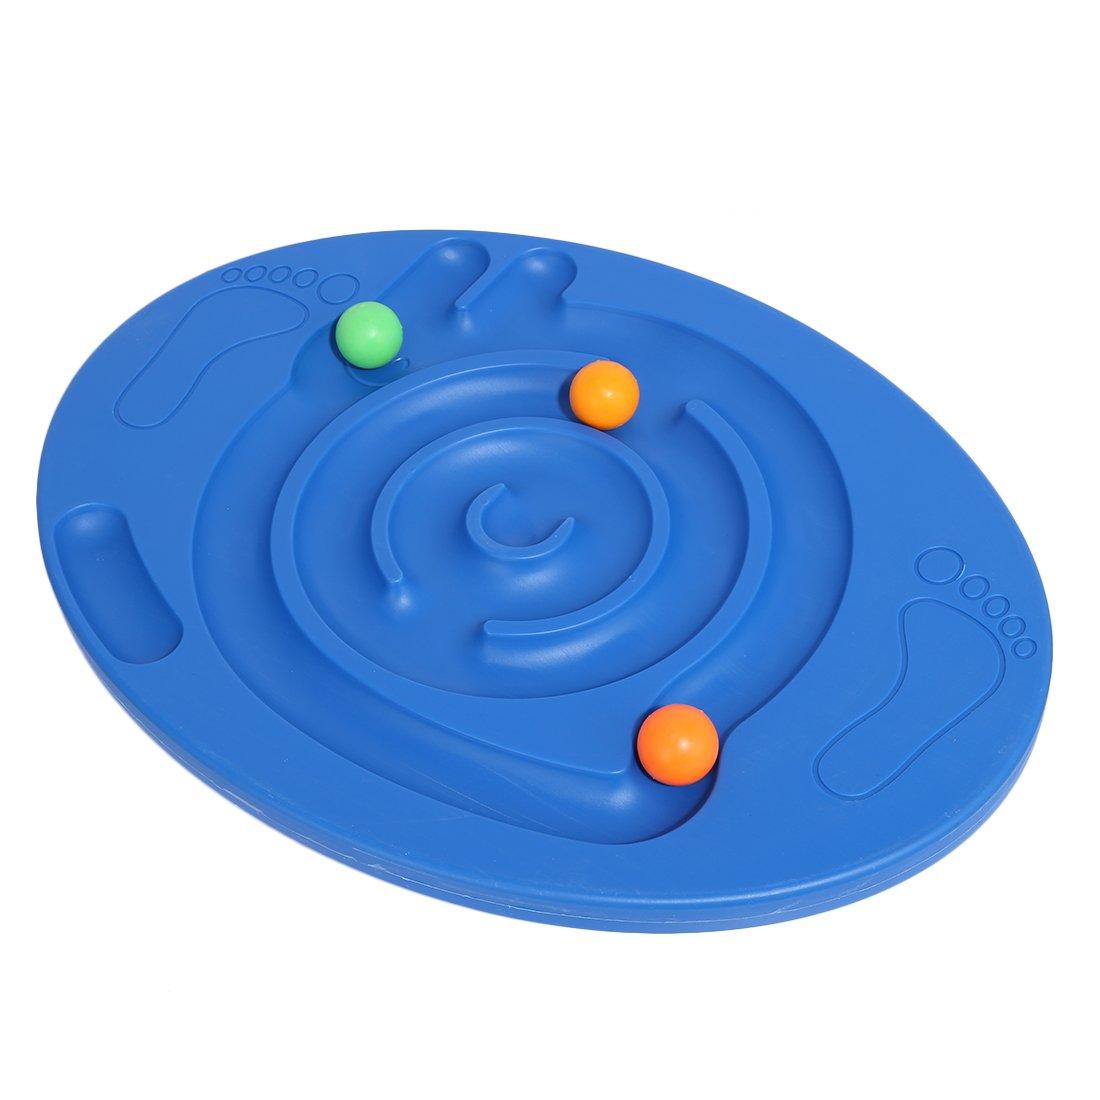 LoKauf Kinder Balance Board Balancierbrett Balancier Schnecke Fußbrett Geduldspiel